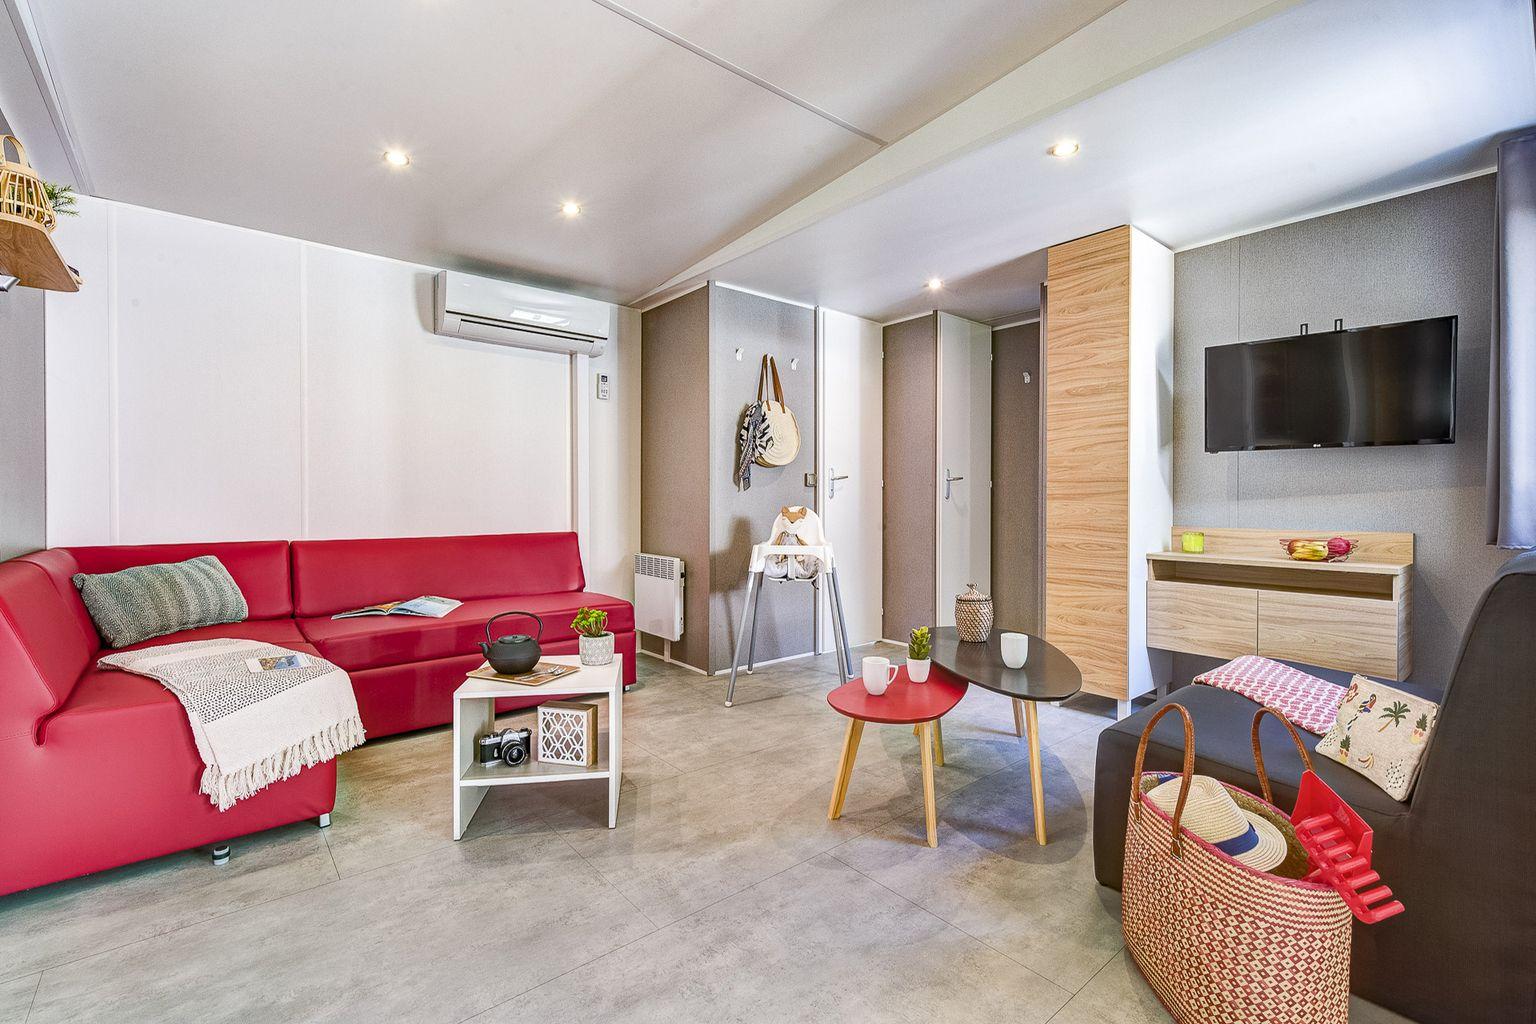 Location - Cottage Friends 6 Chambres - 2 Salles De Bain - Climatisation **** - Camping Sandaya Les Alicourts